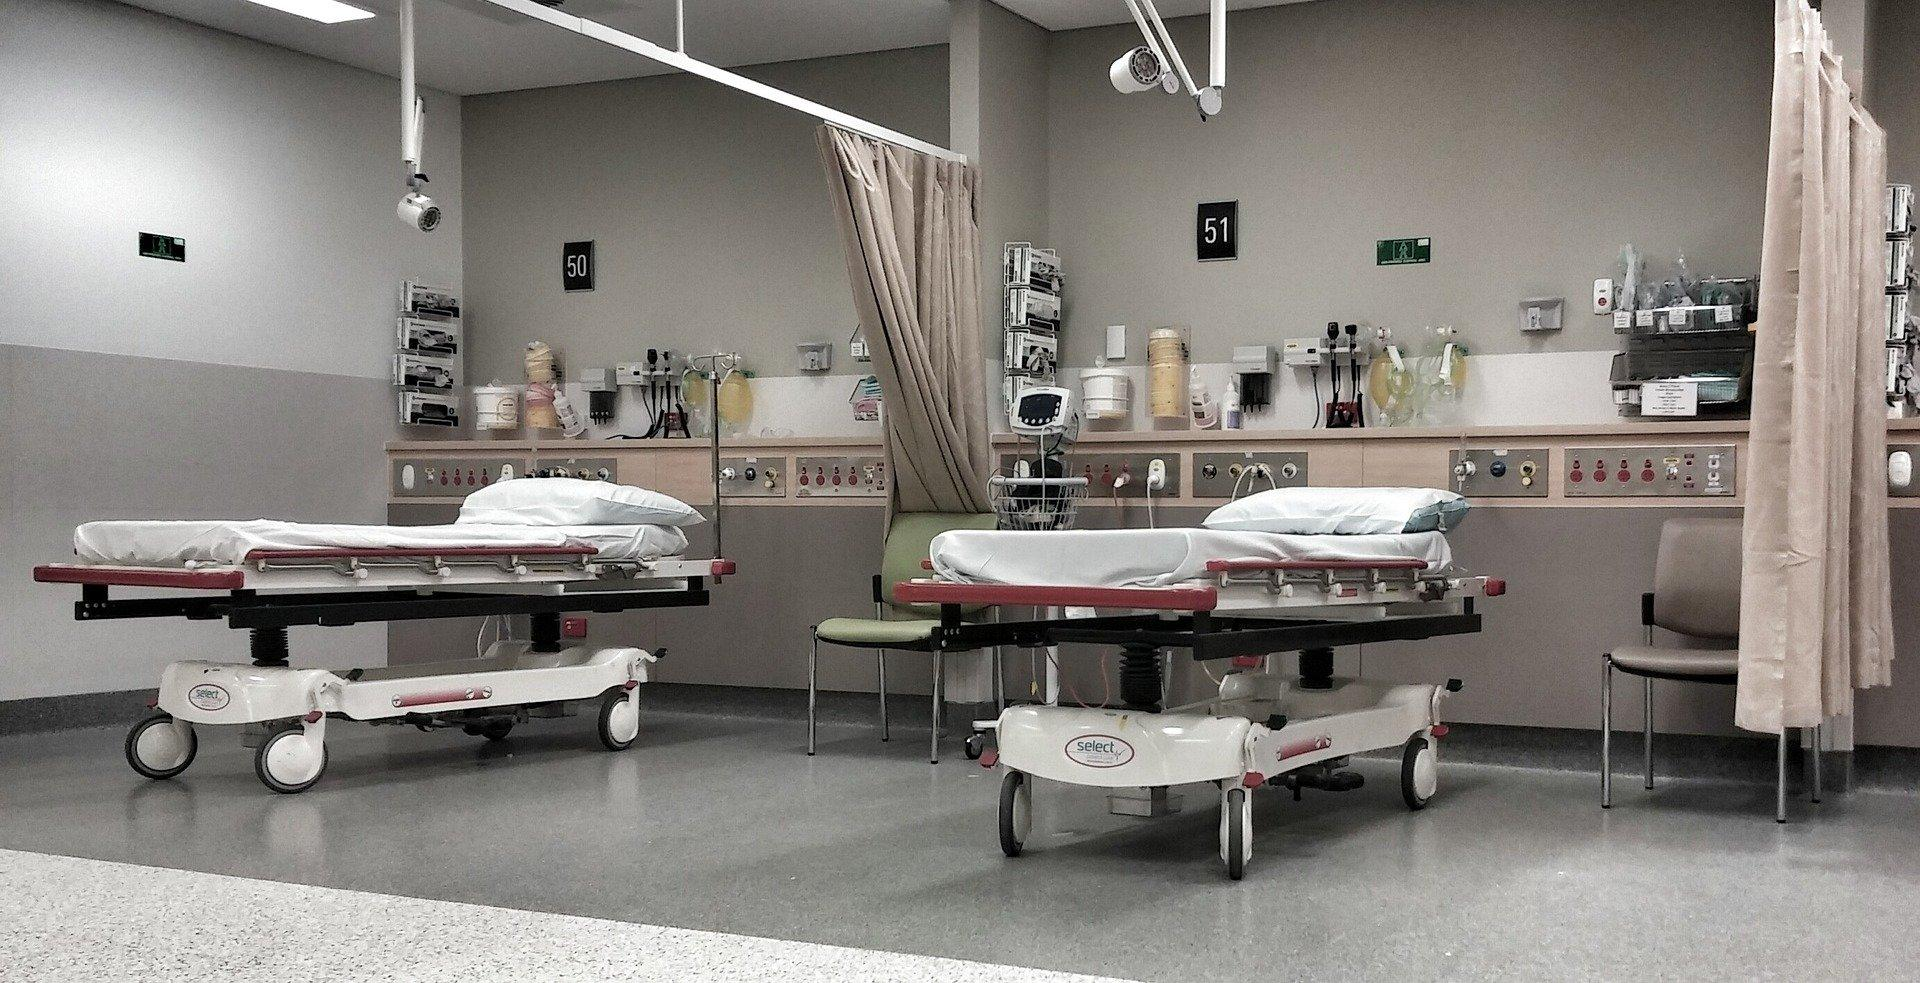 Coronavirus, 1 mort et 5 patients en réanimation en 24 heures en Haute Garonne